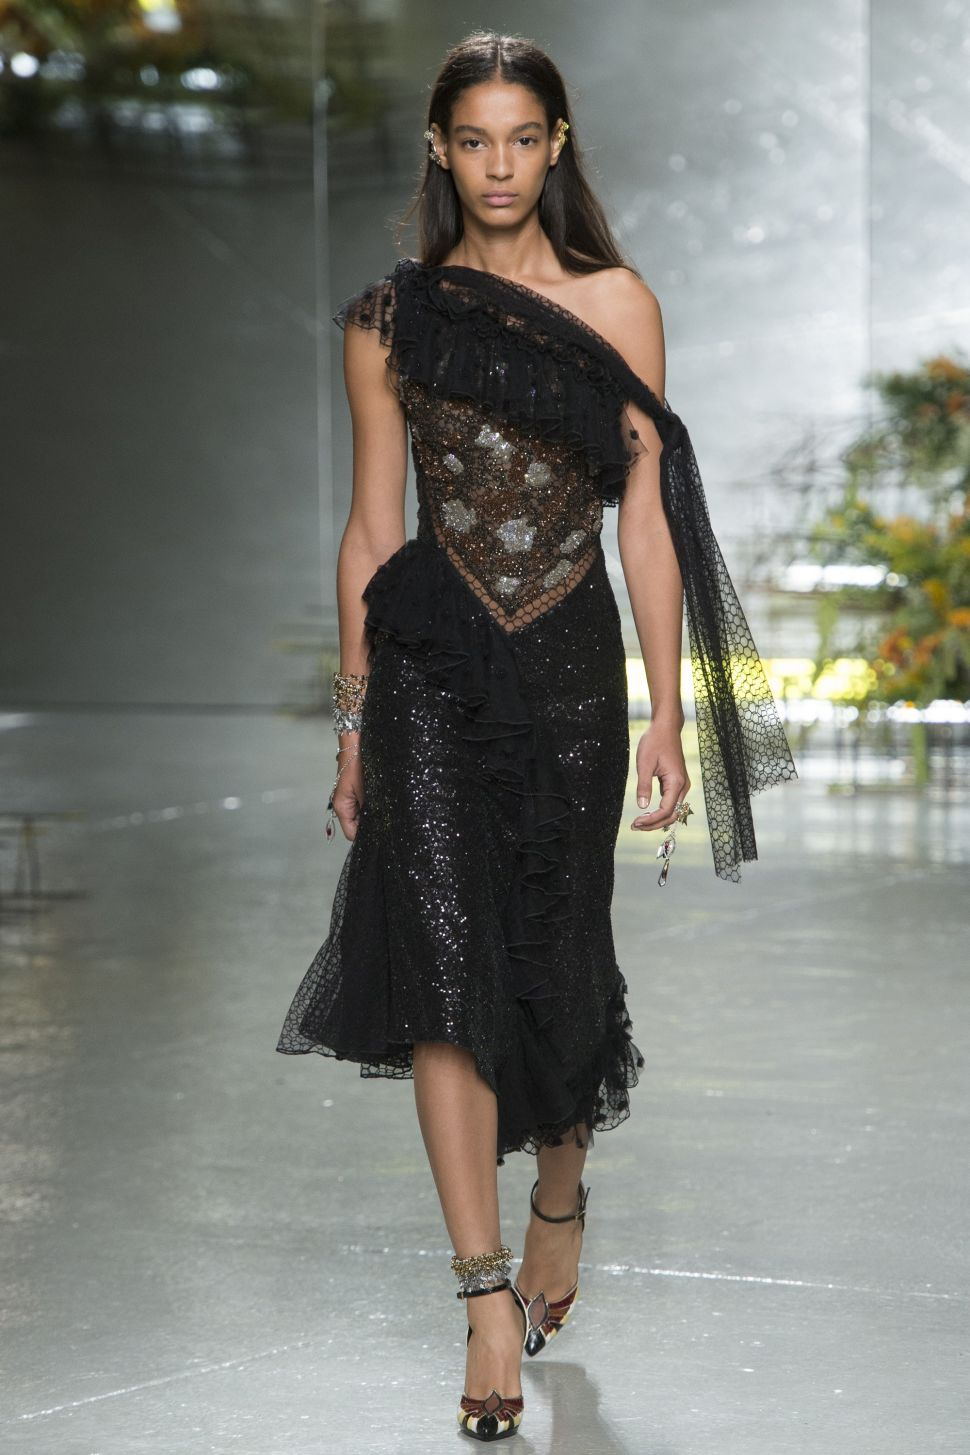 Five Minutes With NYFW's Breakout Model, Luisana Gonzalez